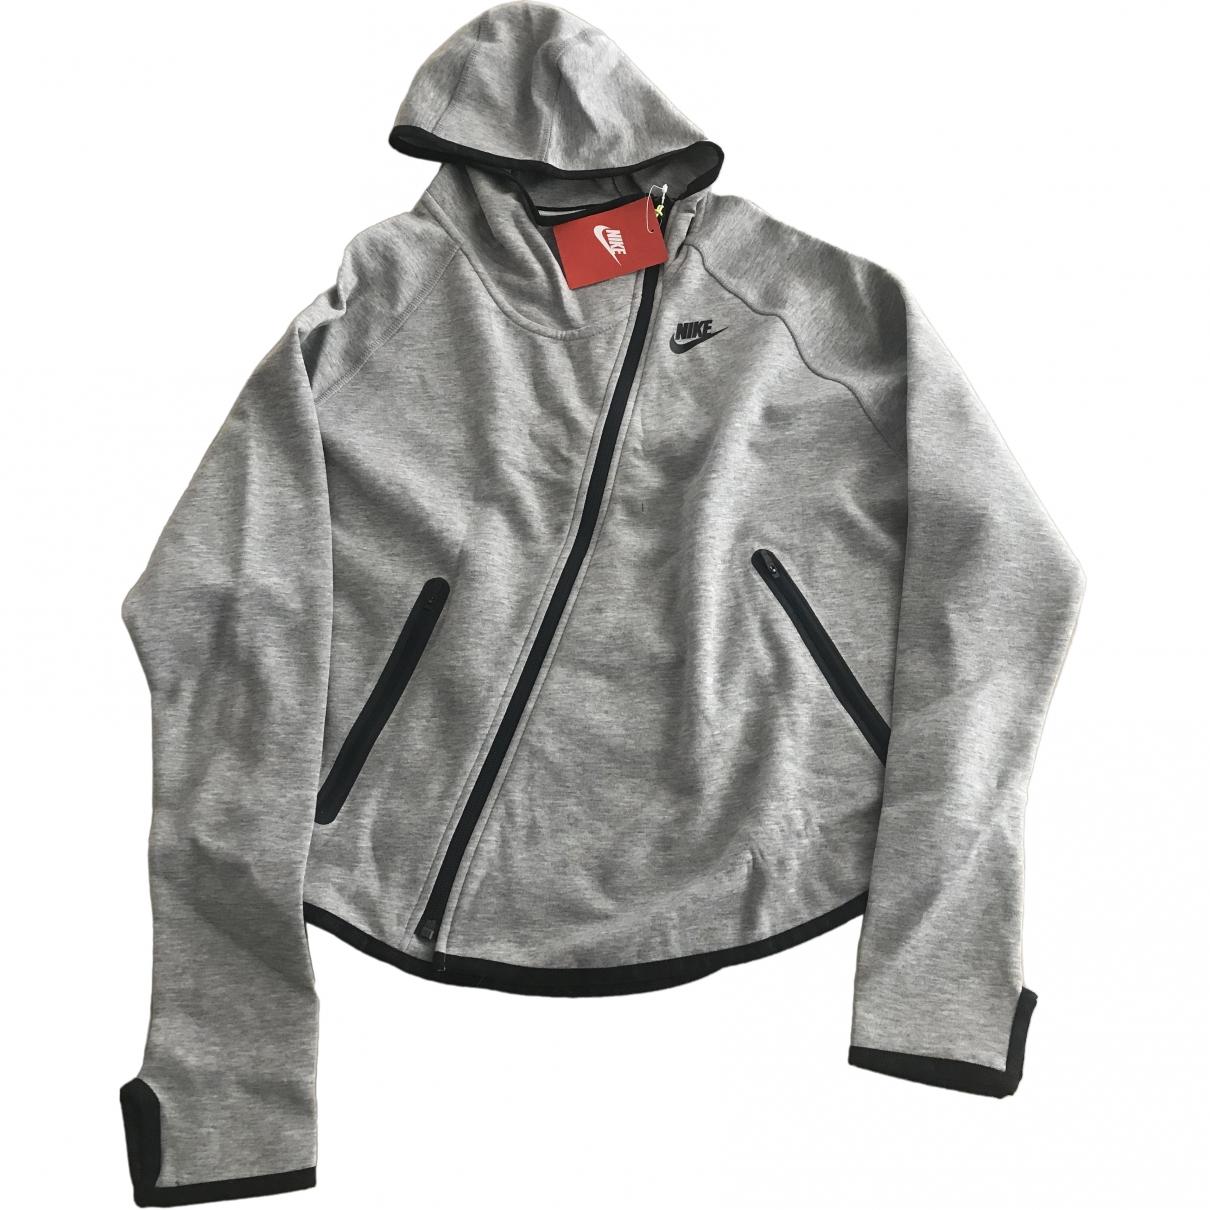 Nike \N Grey Cotton jacket for Women M International